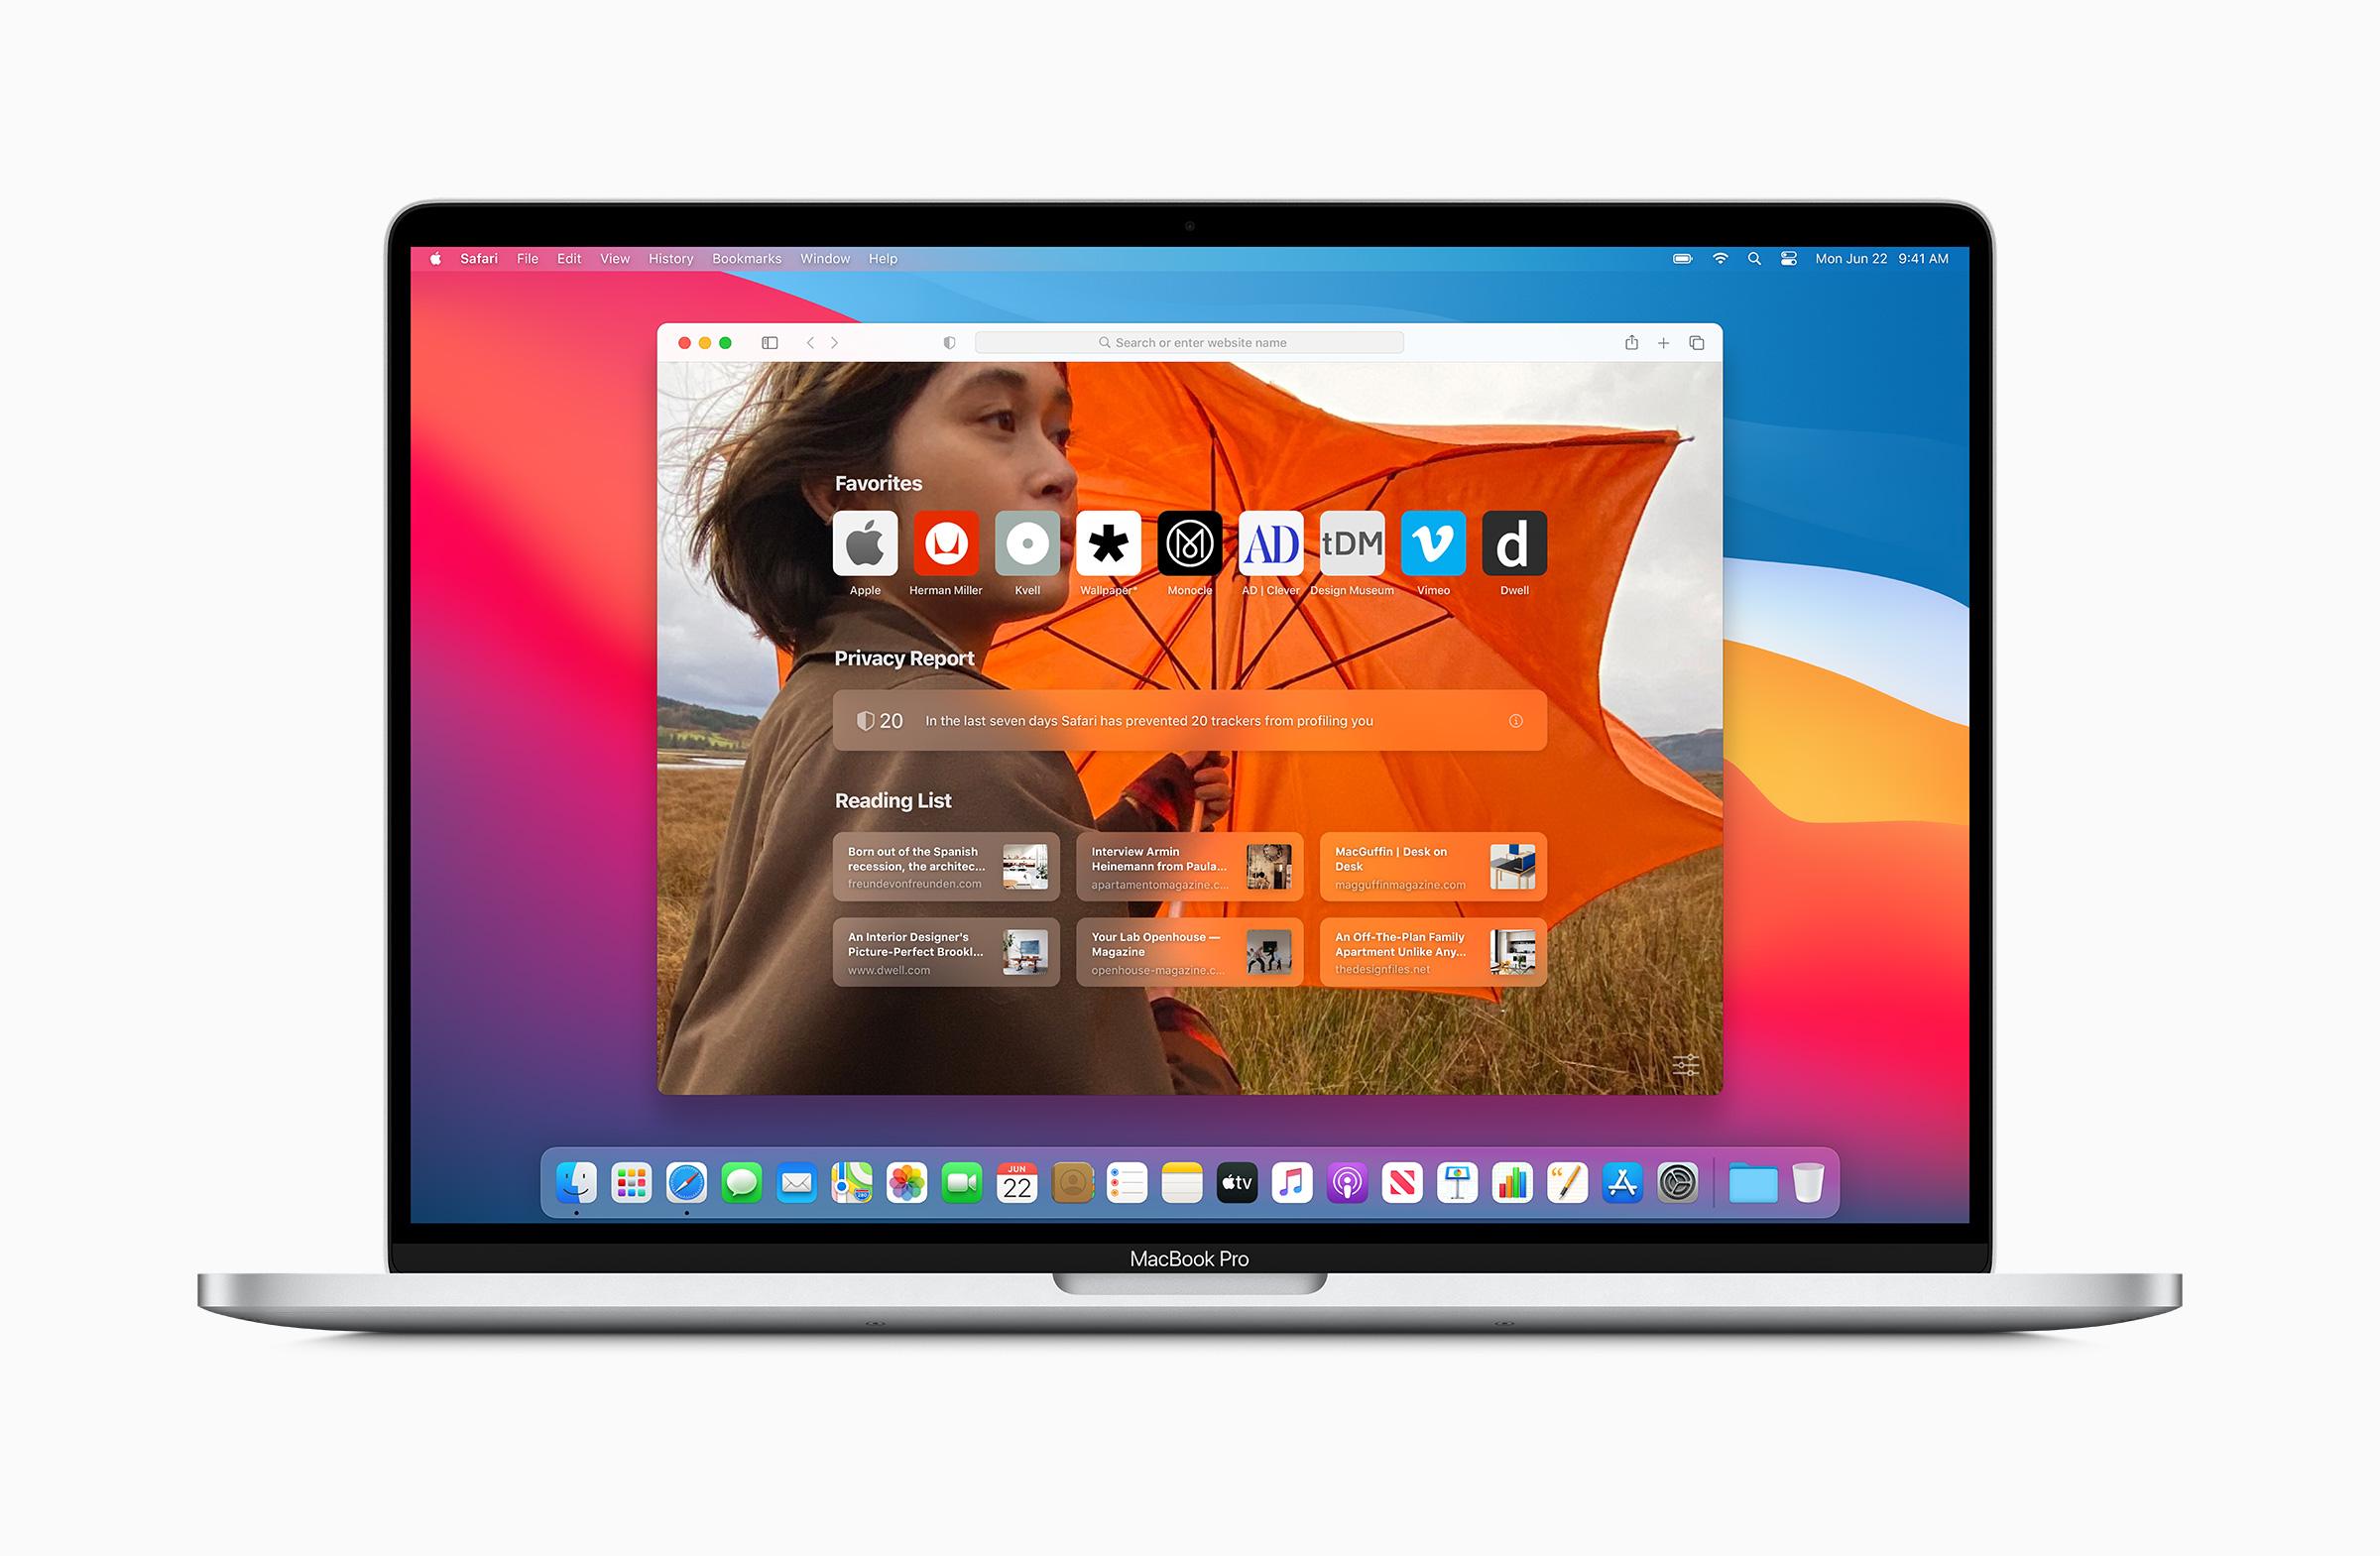 apple_macos-big-sur_customized-safari-start-page